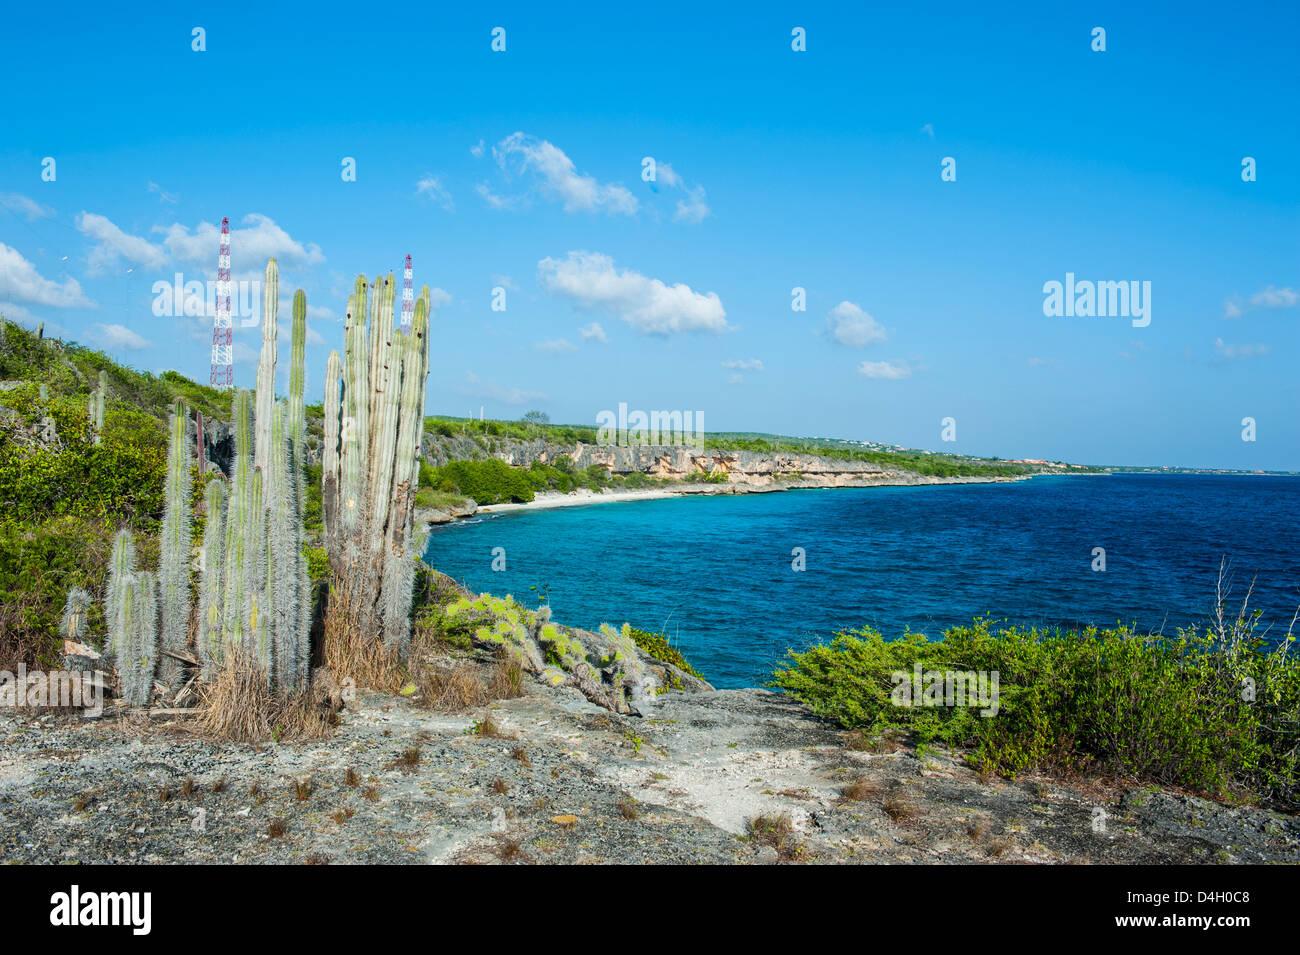 Coast line in the Washington-Slagbaai National Park, Bonaire, ABC Islands, Netherlands Antilles, Caribbean - Stock Image